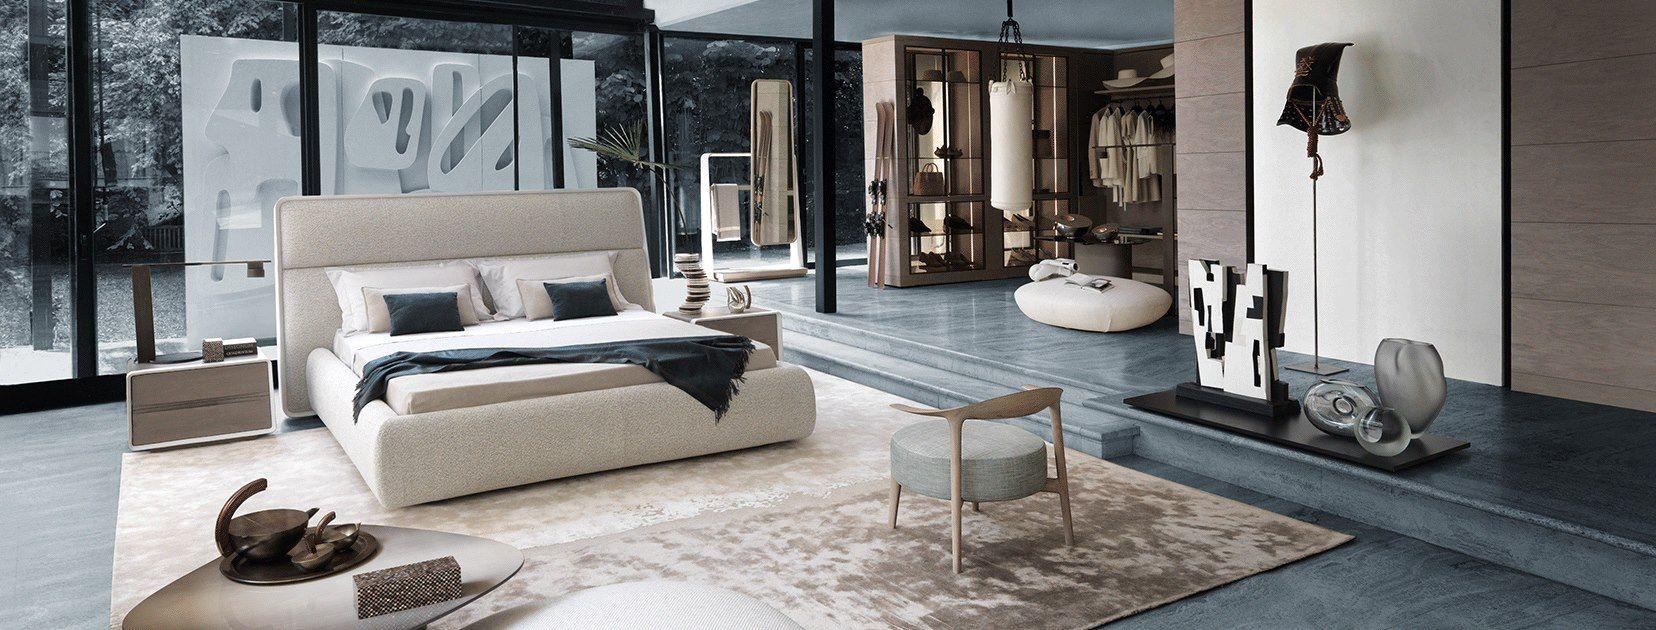 Top 10 Italian Furniture Brands Made In Italy Italian